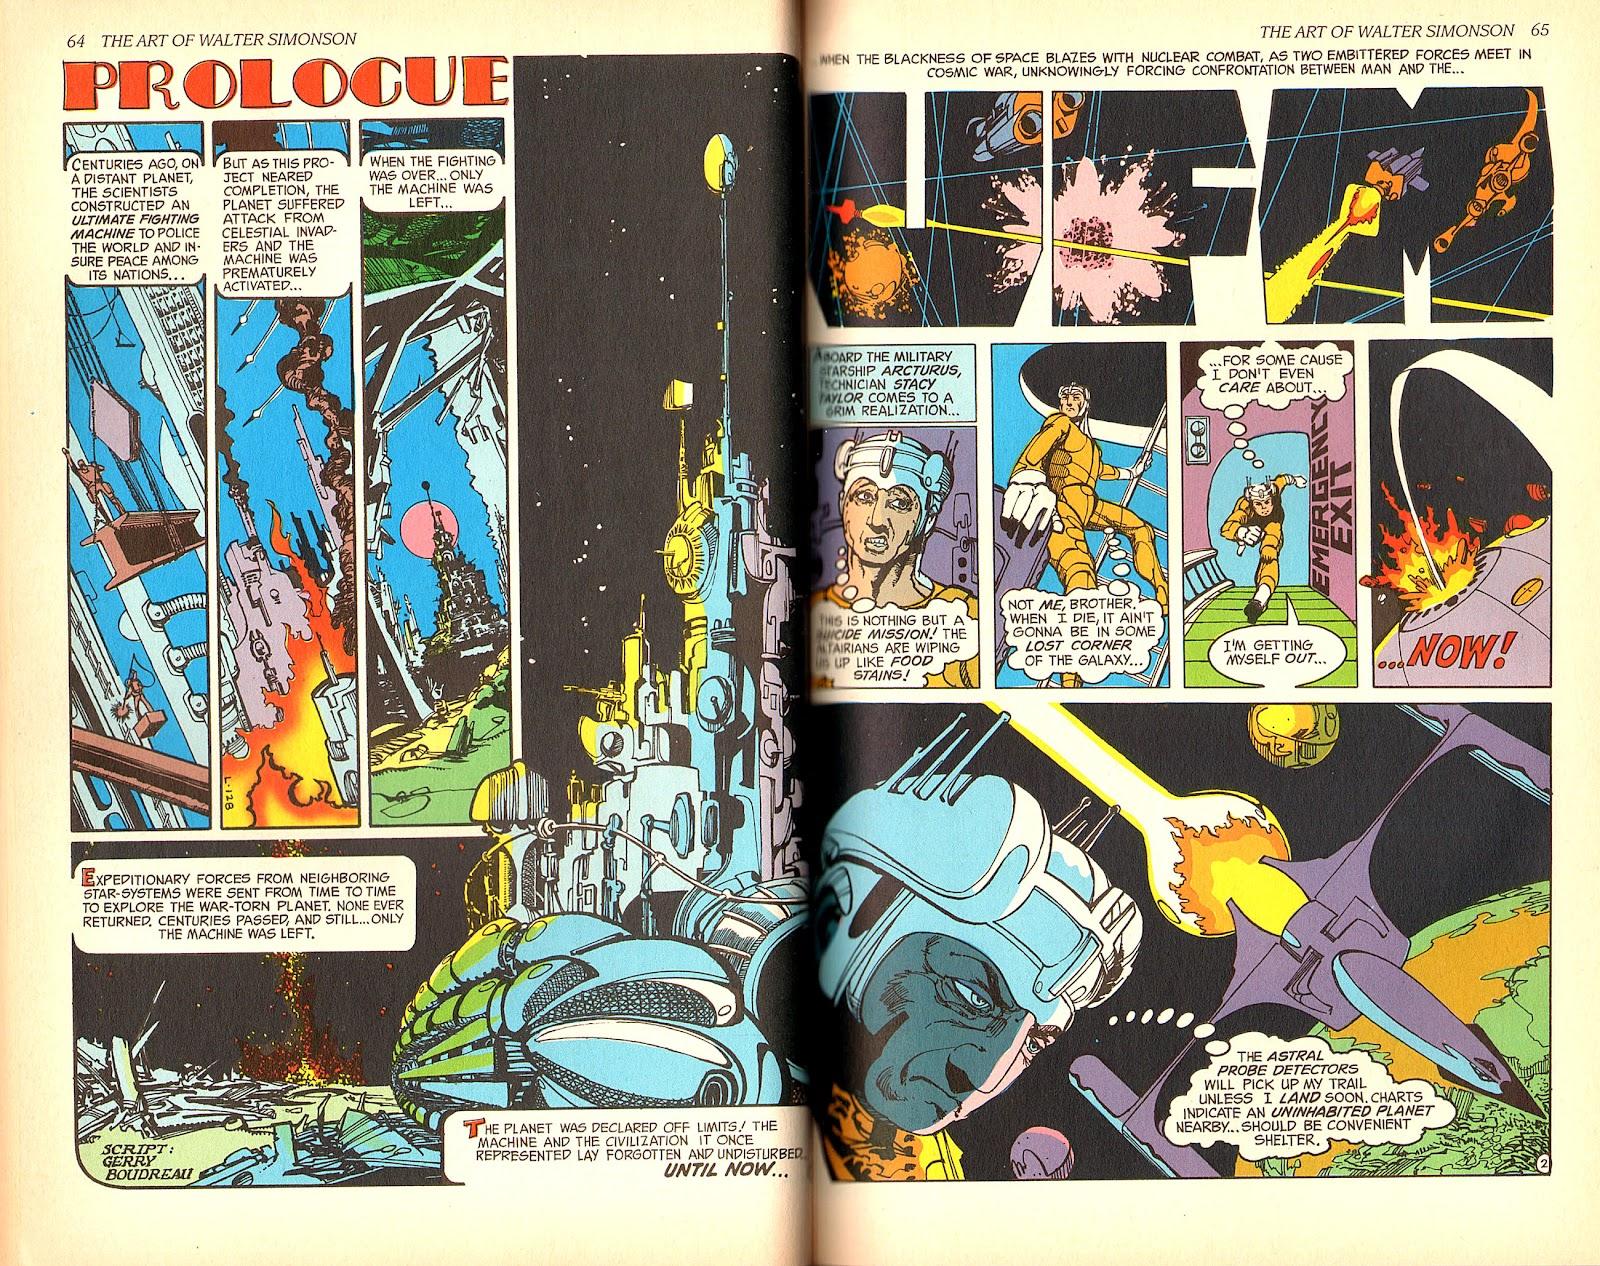 Read online The Art of Walter Simonson comic -  Issue # TPB - 34